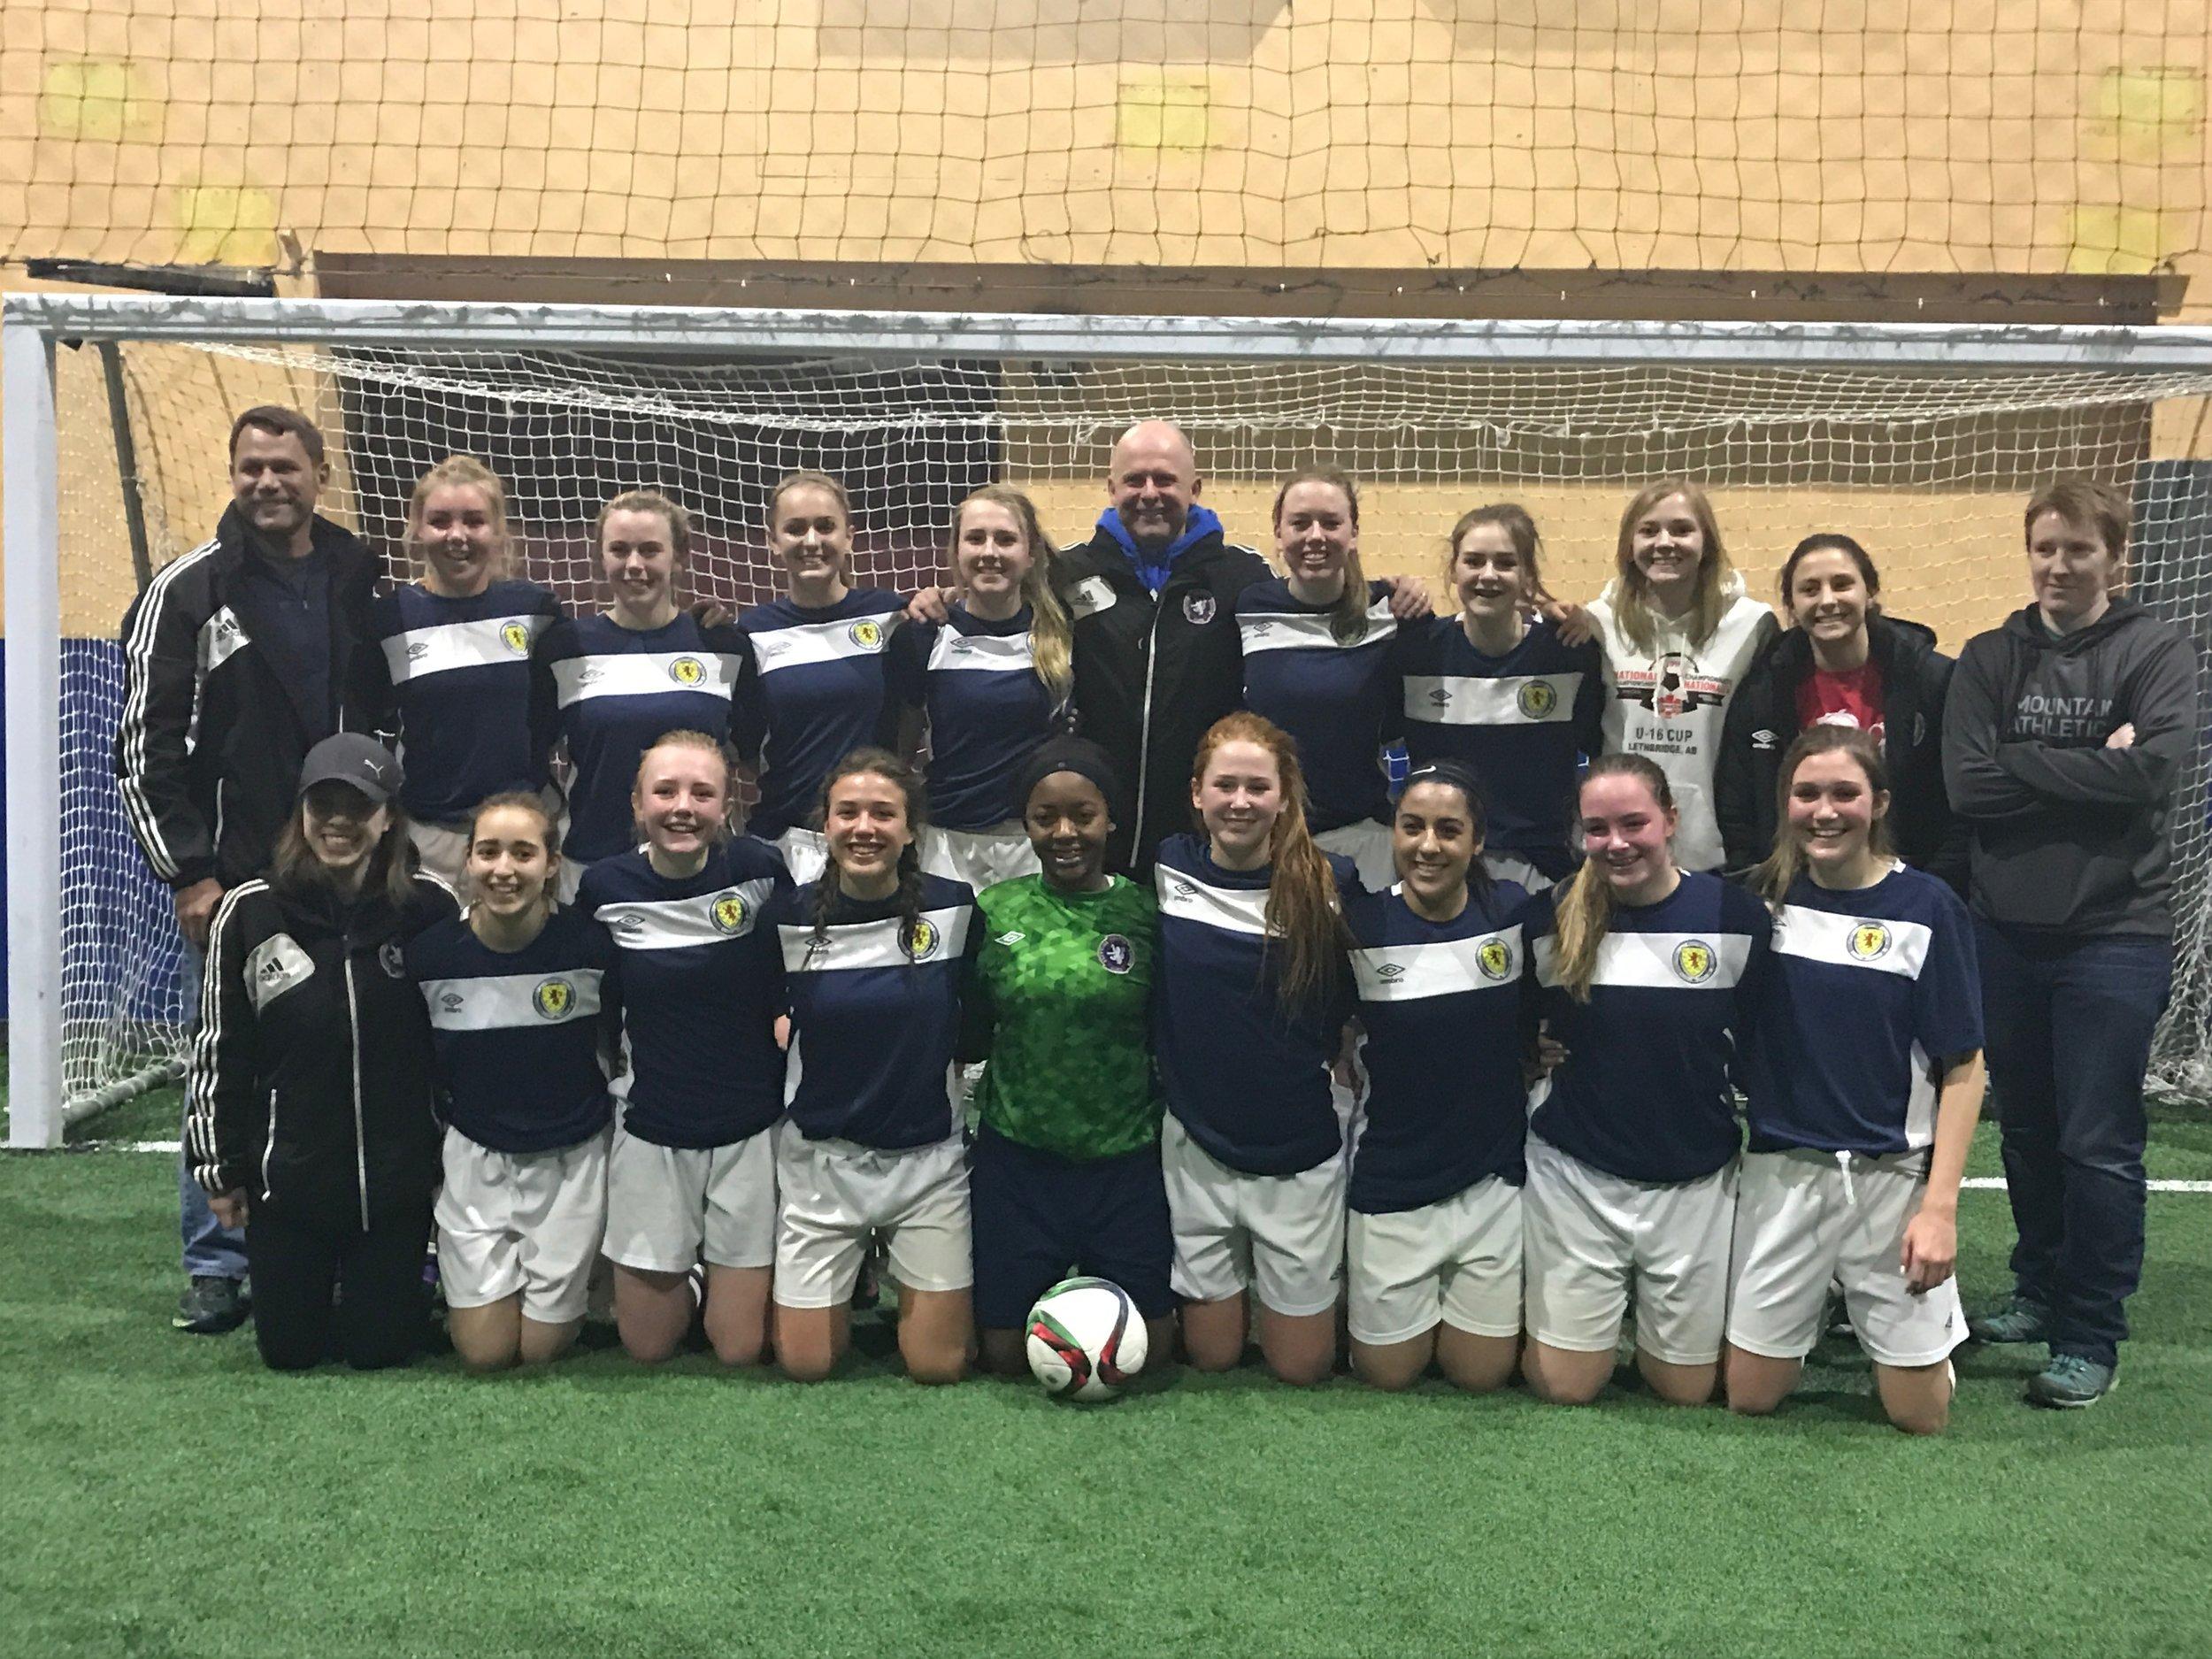 Under 17 T1 Girls - EIYSA League Champions